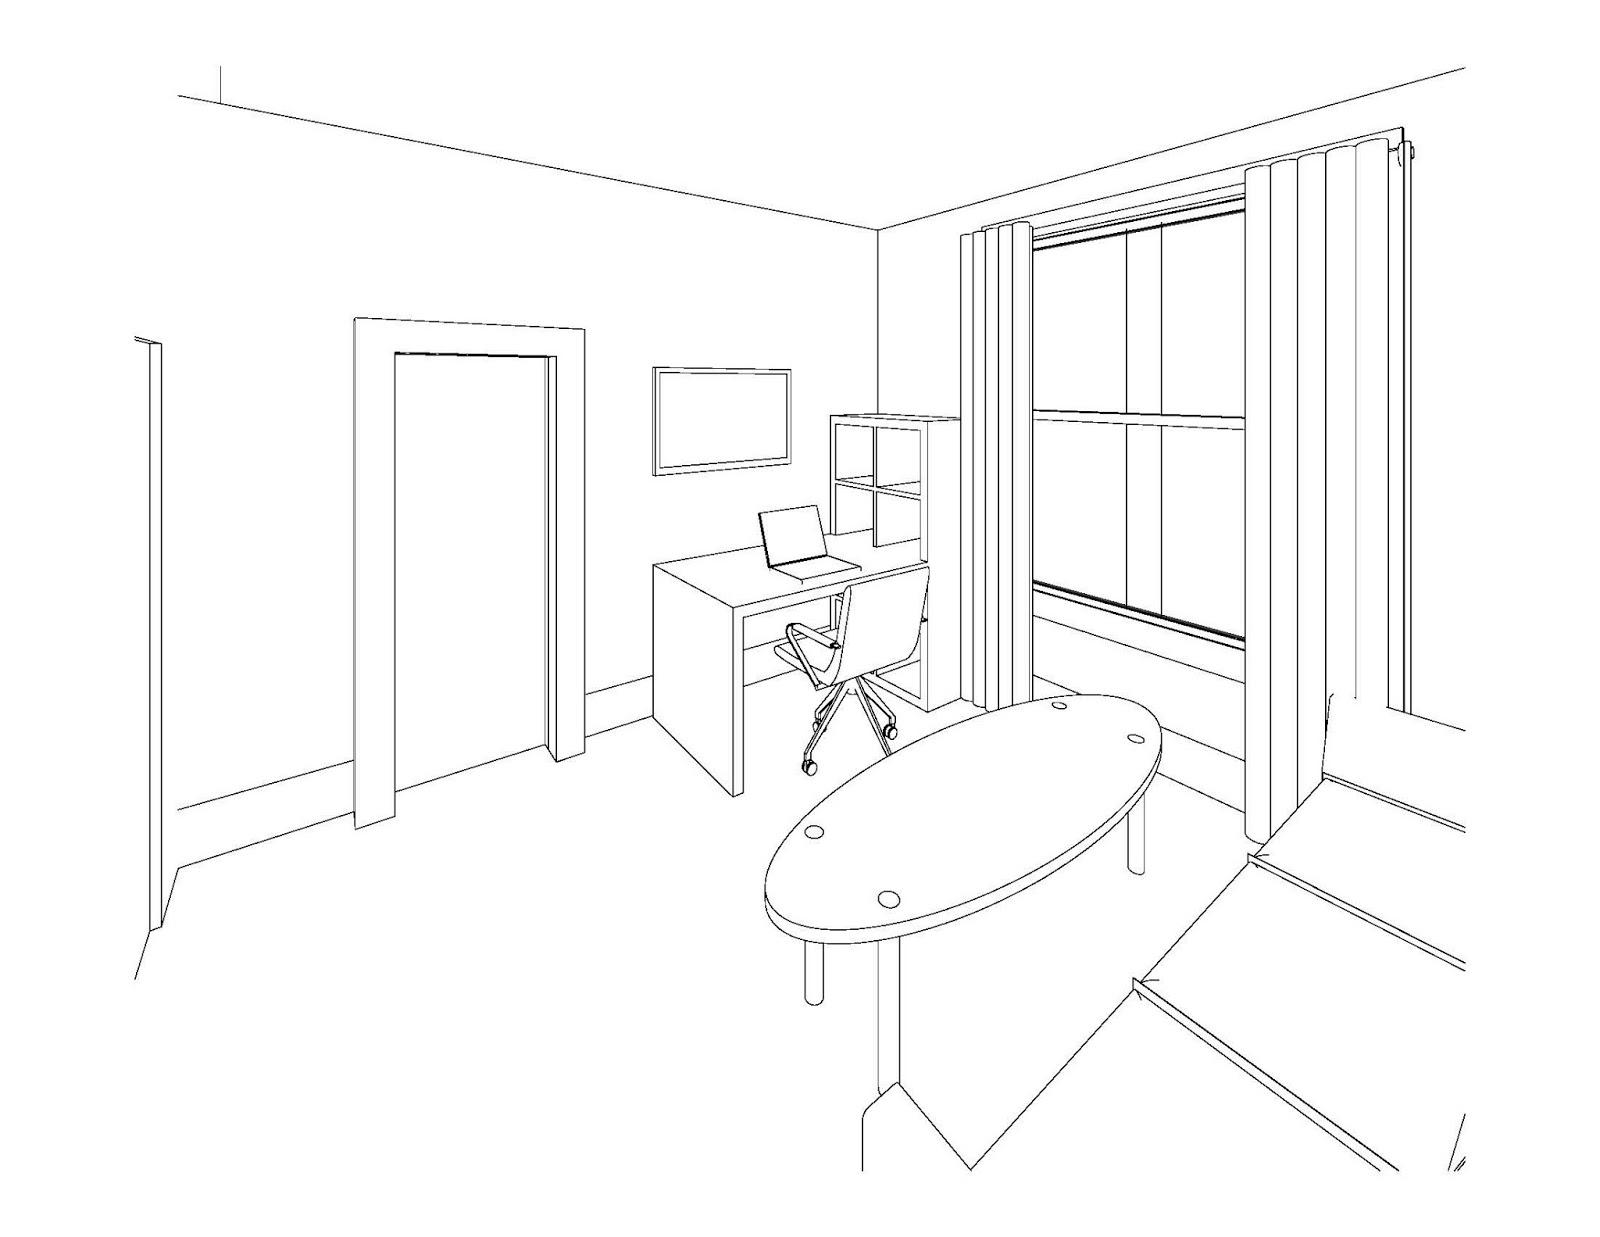 1600x1237 how to draw a room guitar speaker wiring diagrams uml diagram